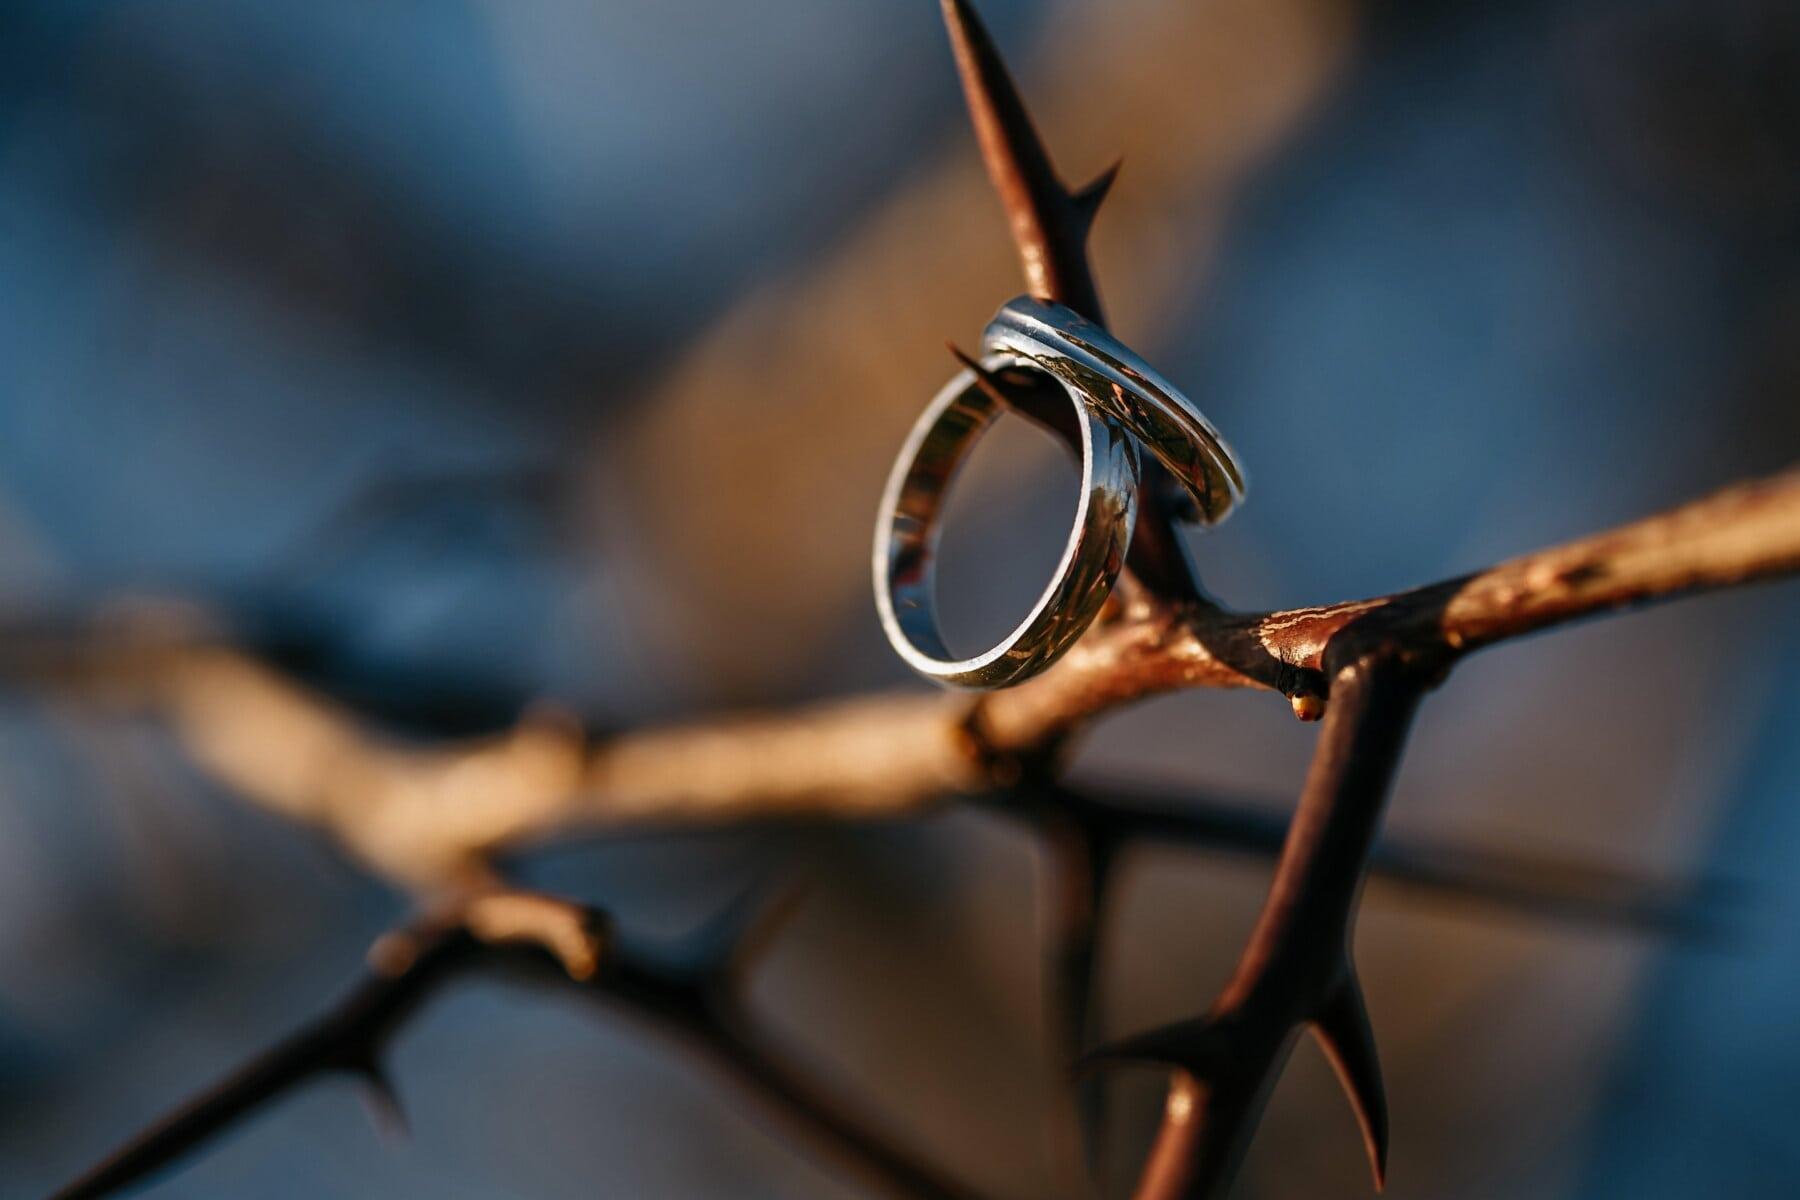 acacia, platinum, thorn, rings, romantic, sharp, blur, wood, outdoors, nature